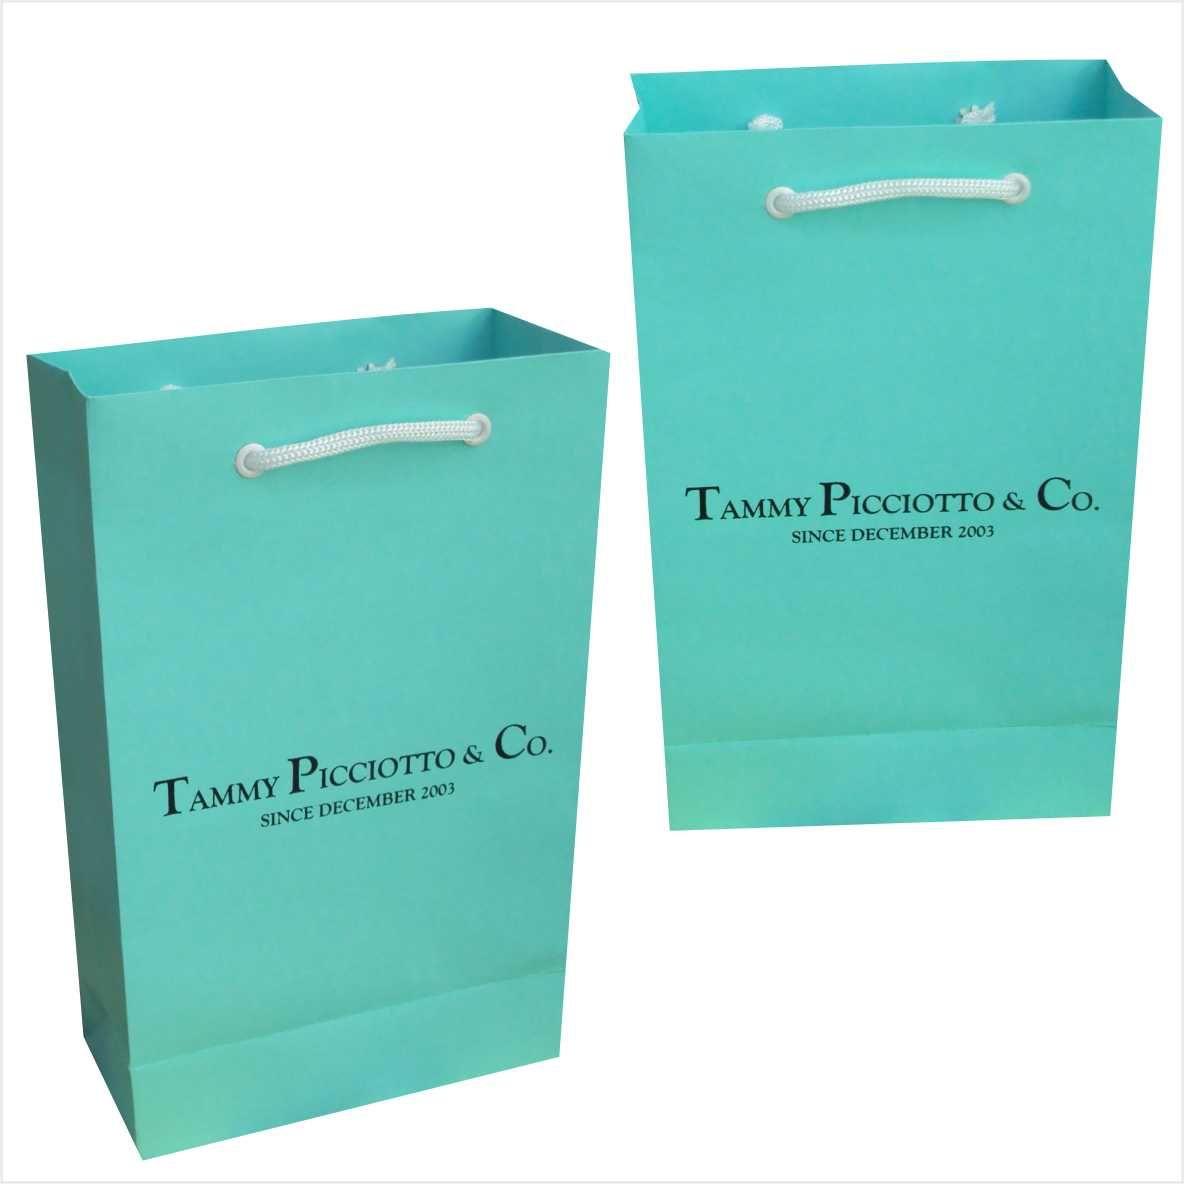 Sacola de papel pequena cor azul tiffany personalizada  (15x24x7 cm)  - 50 unidades